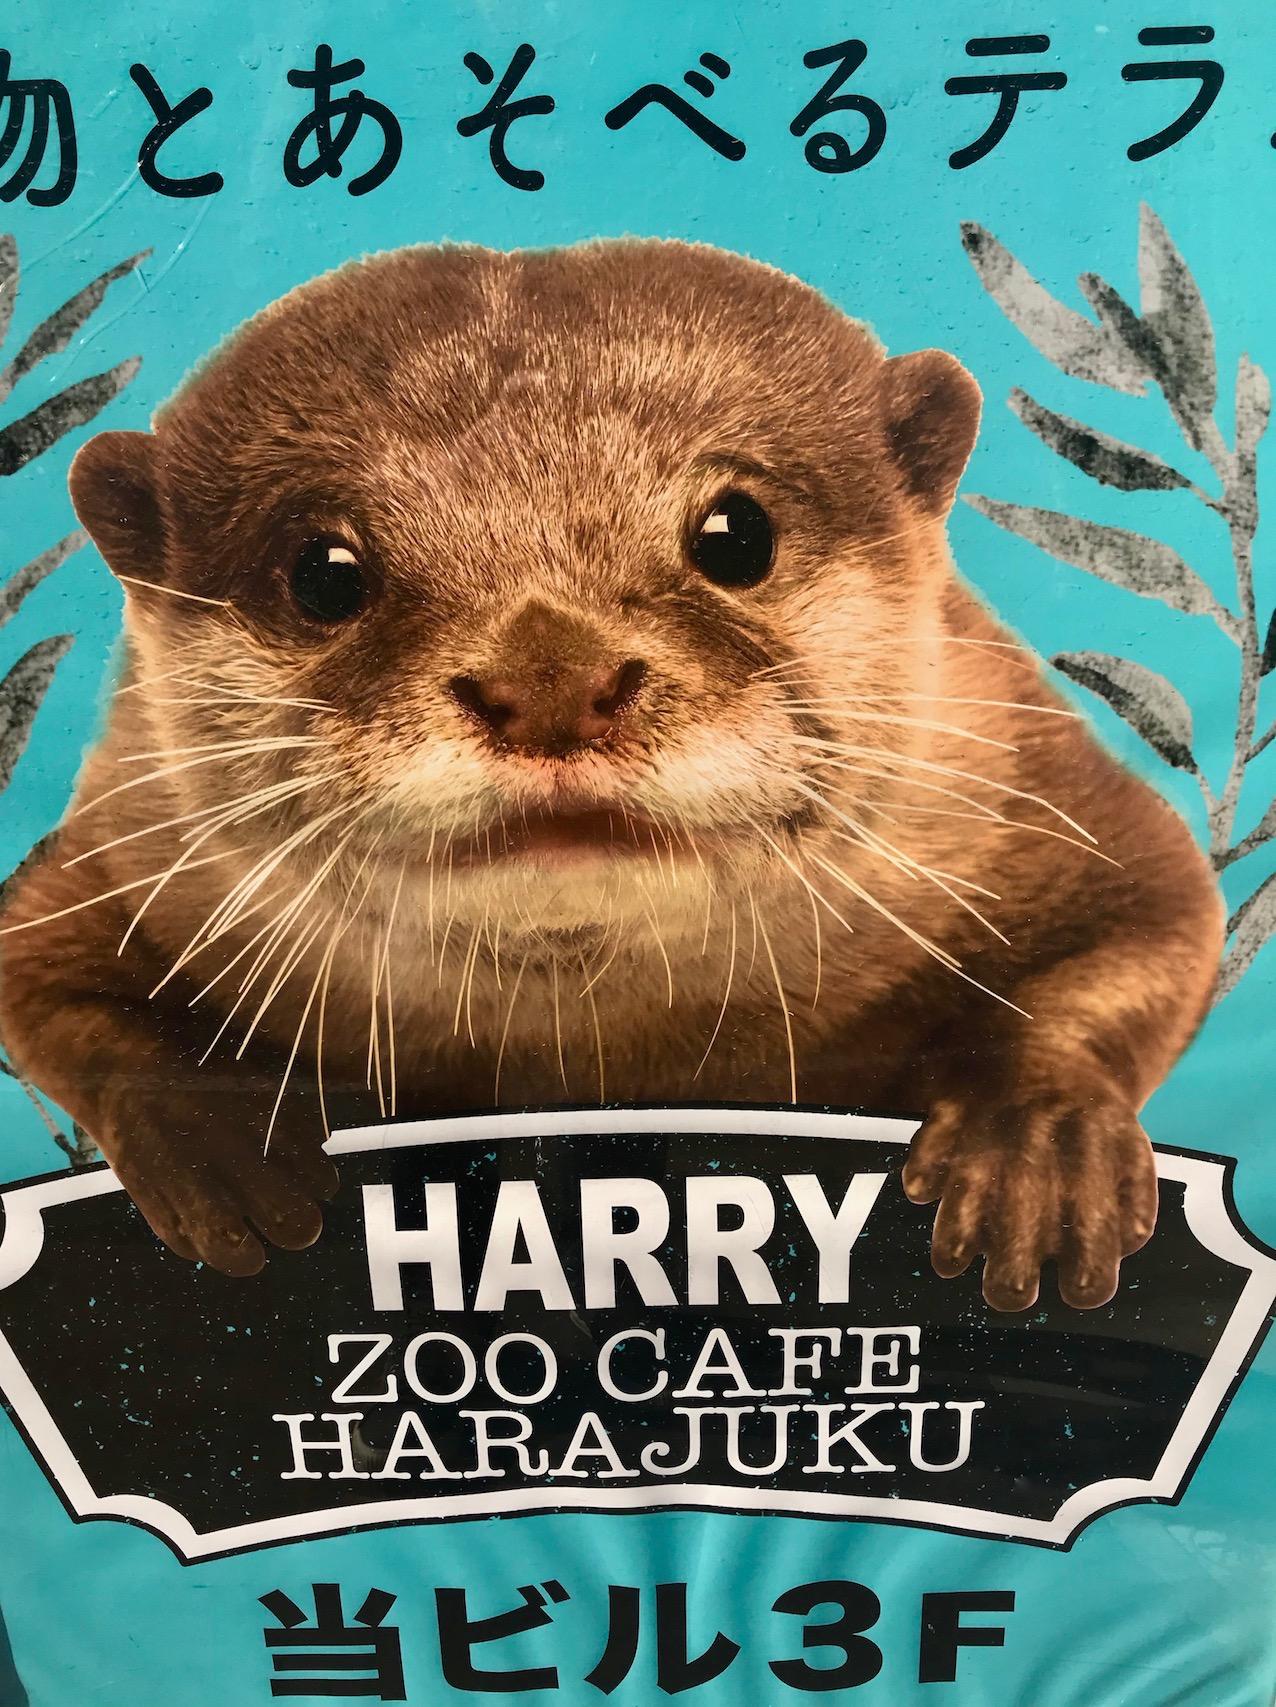 Harry Zoo Cafe Harajuku Tokyo